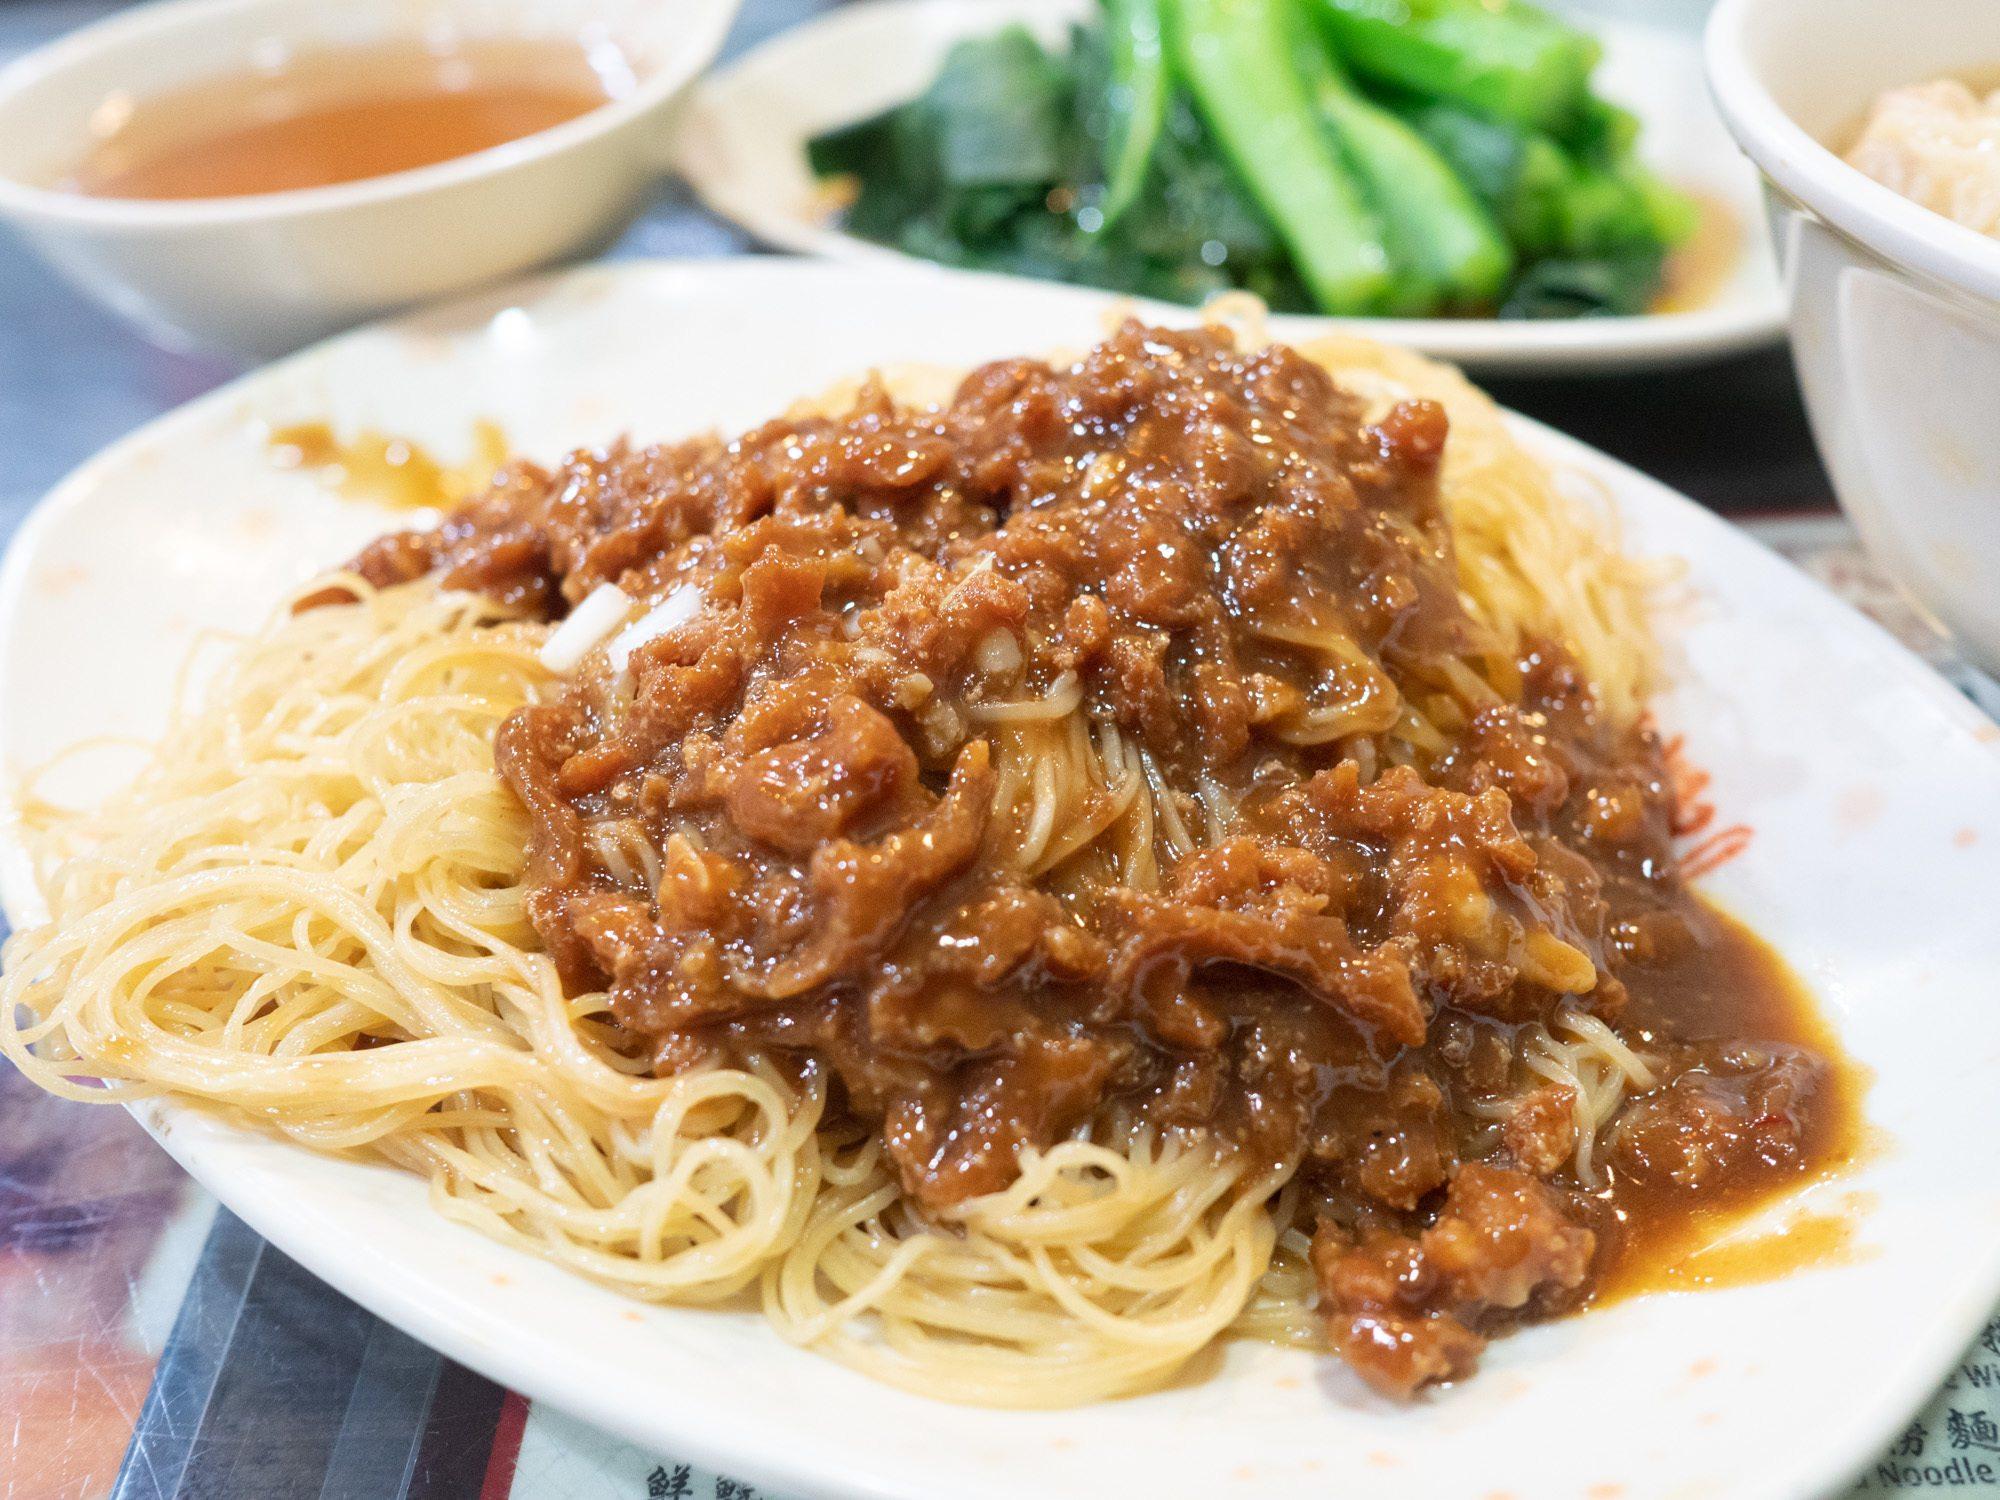 Hong Kong style Zhajiang noodles from good hope restaurant in mongkok